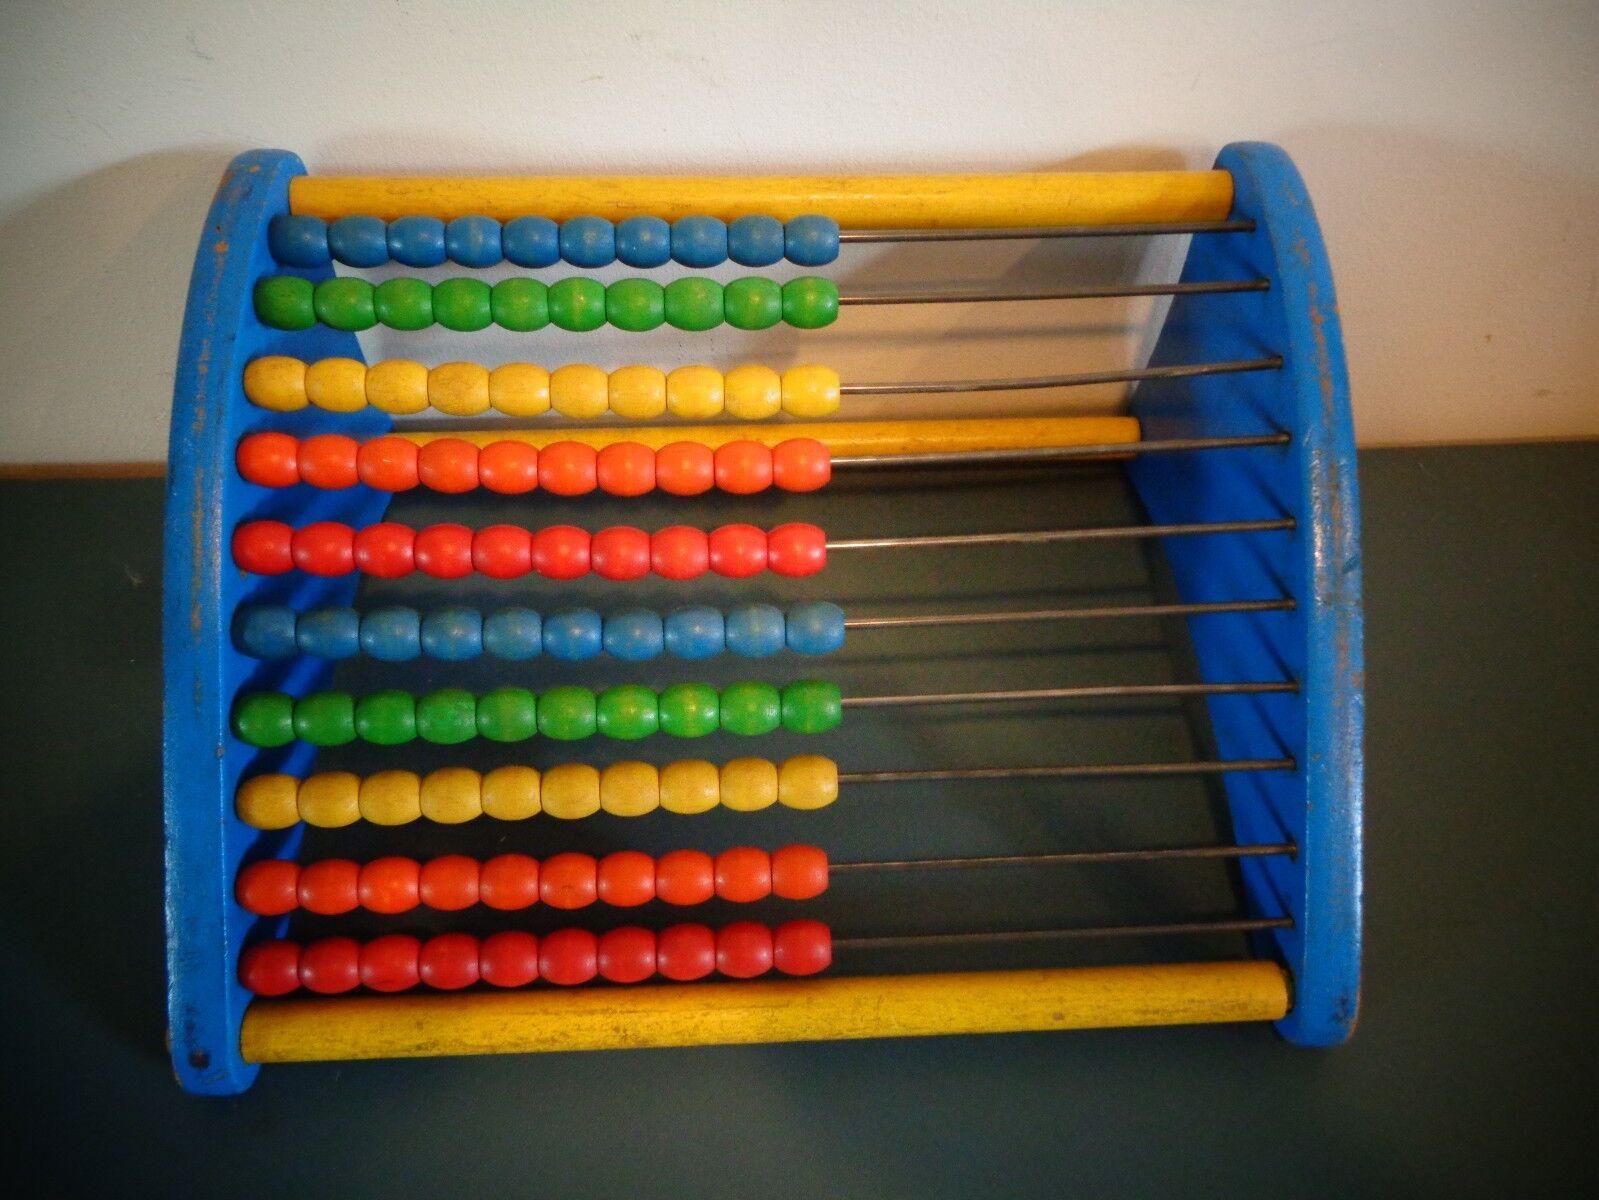 Oldtimer - playskool holz abakus zählen der mathe - spielzeug